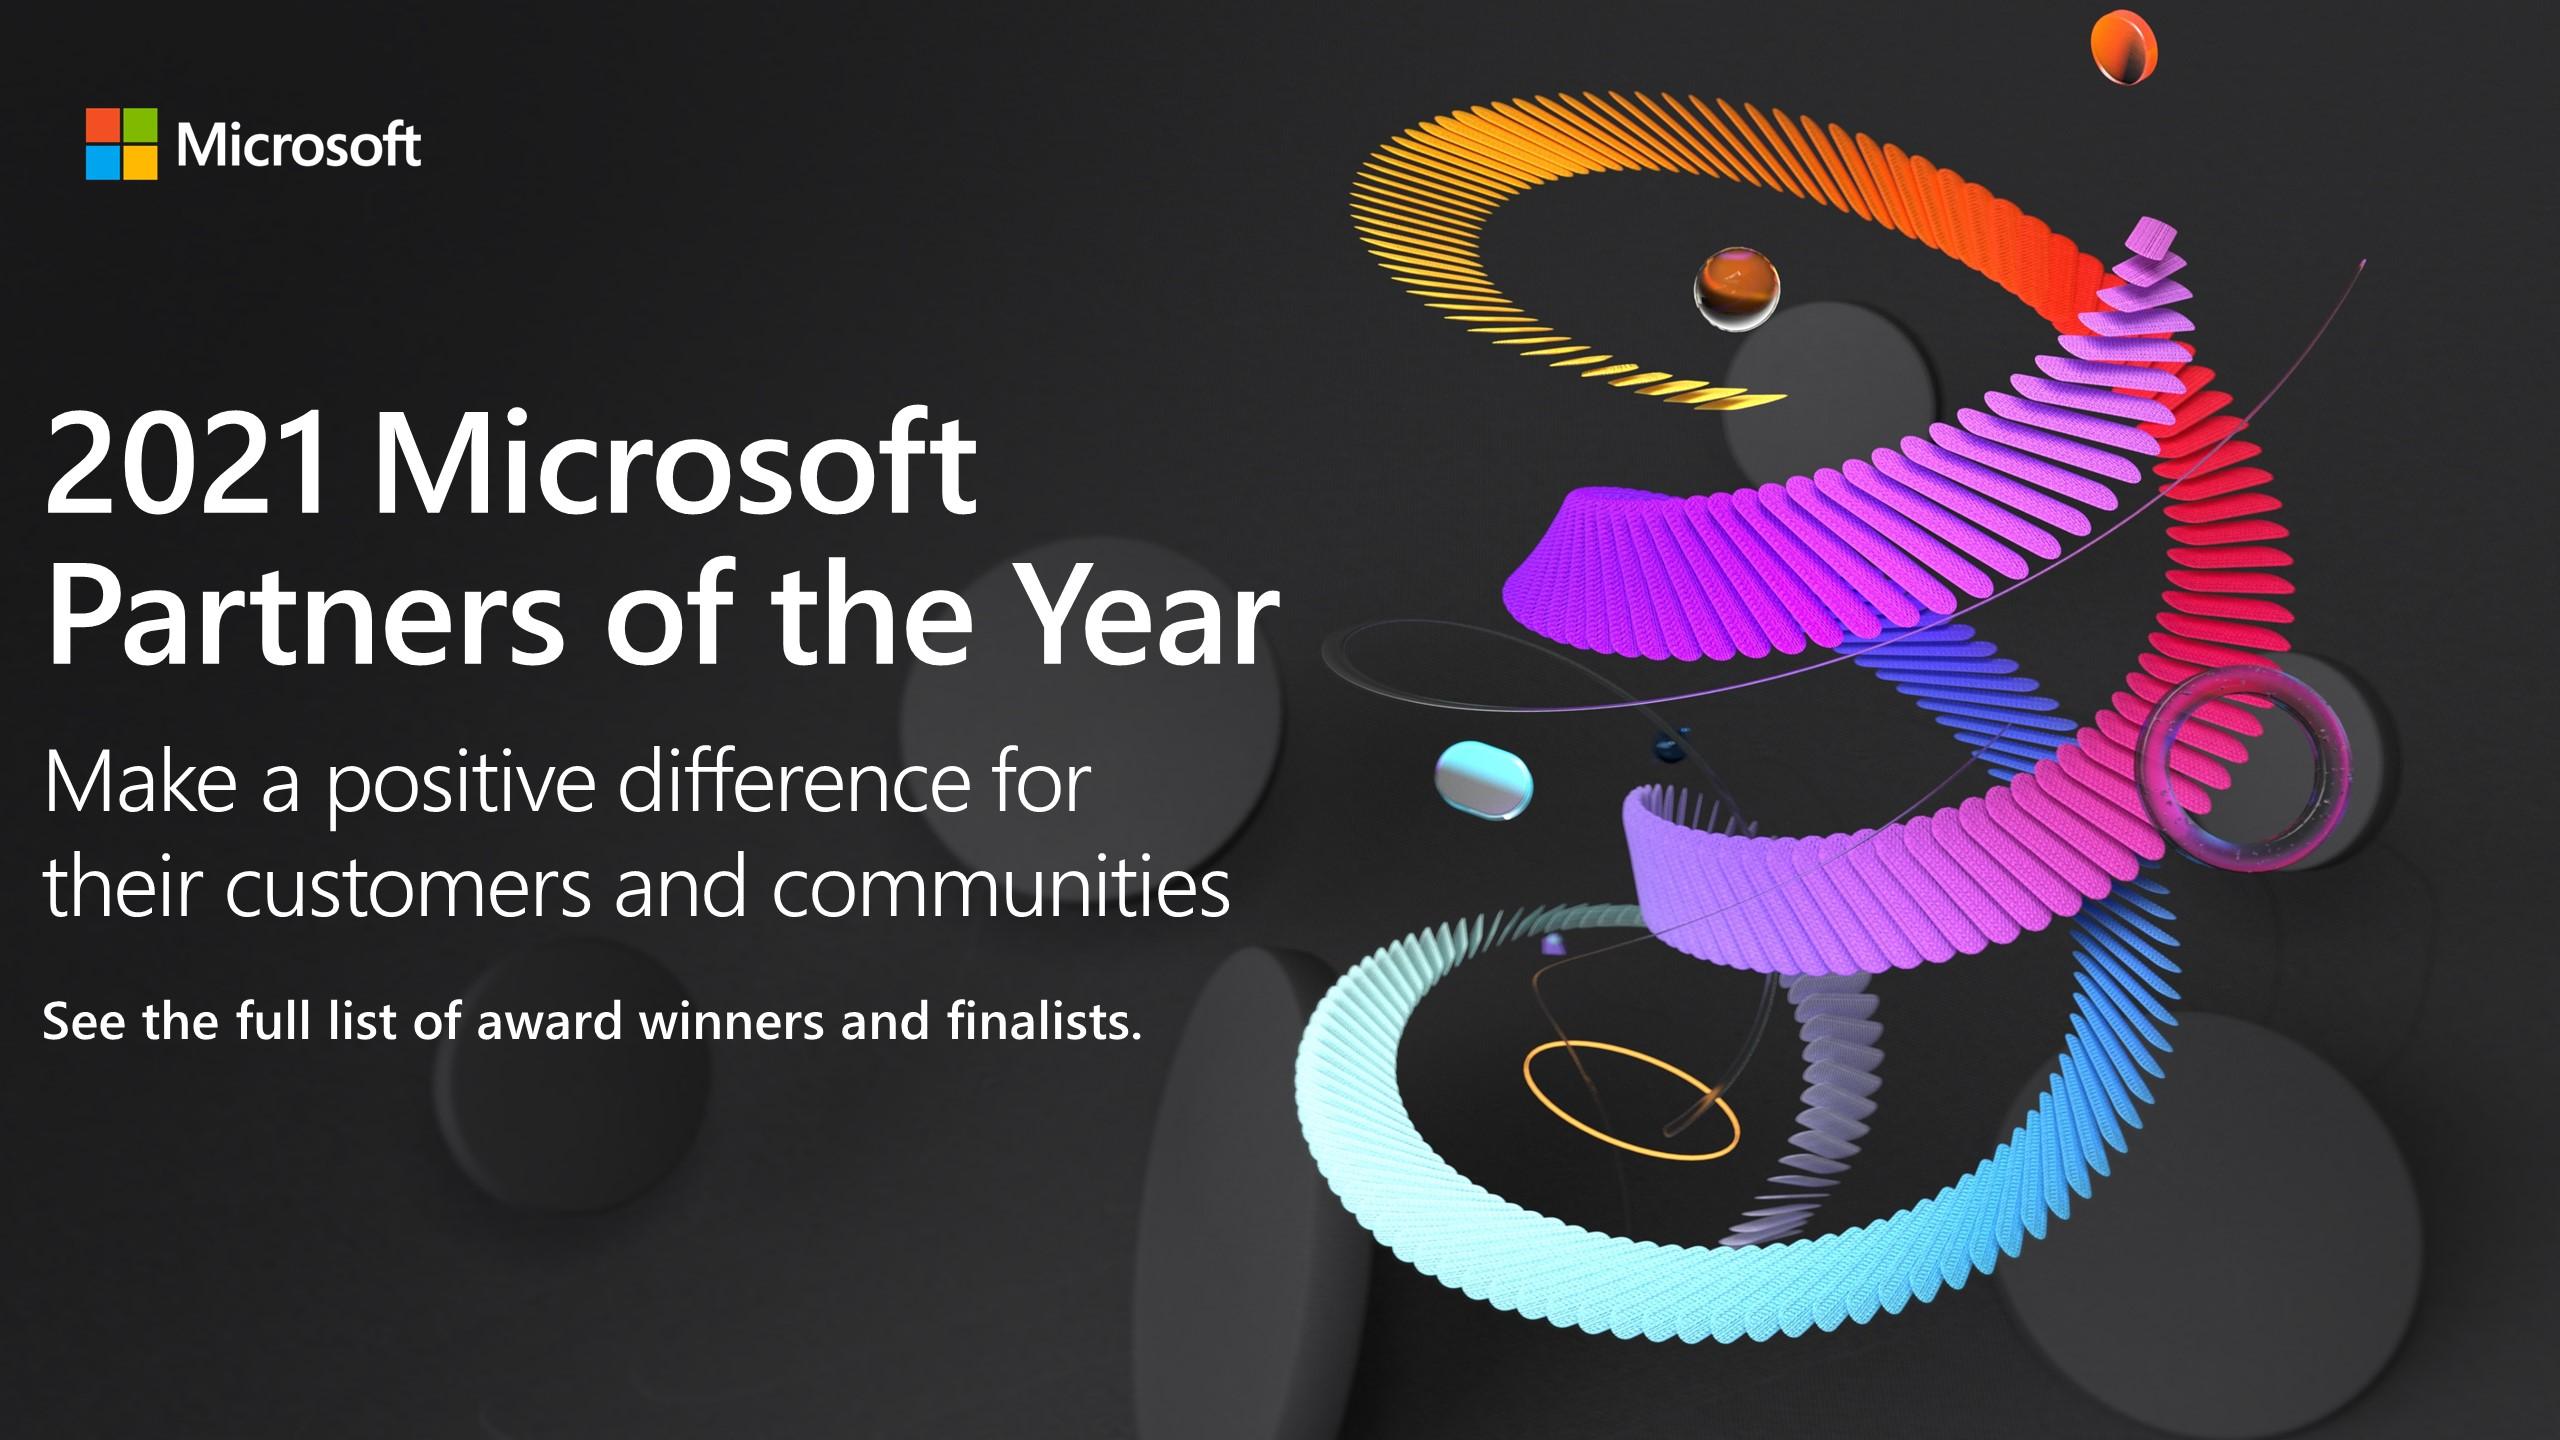 Microsoft partner of the year award winners